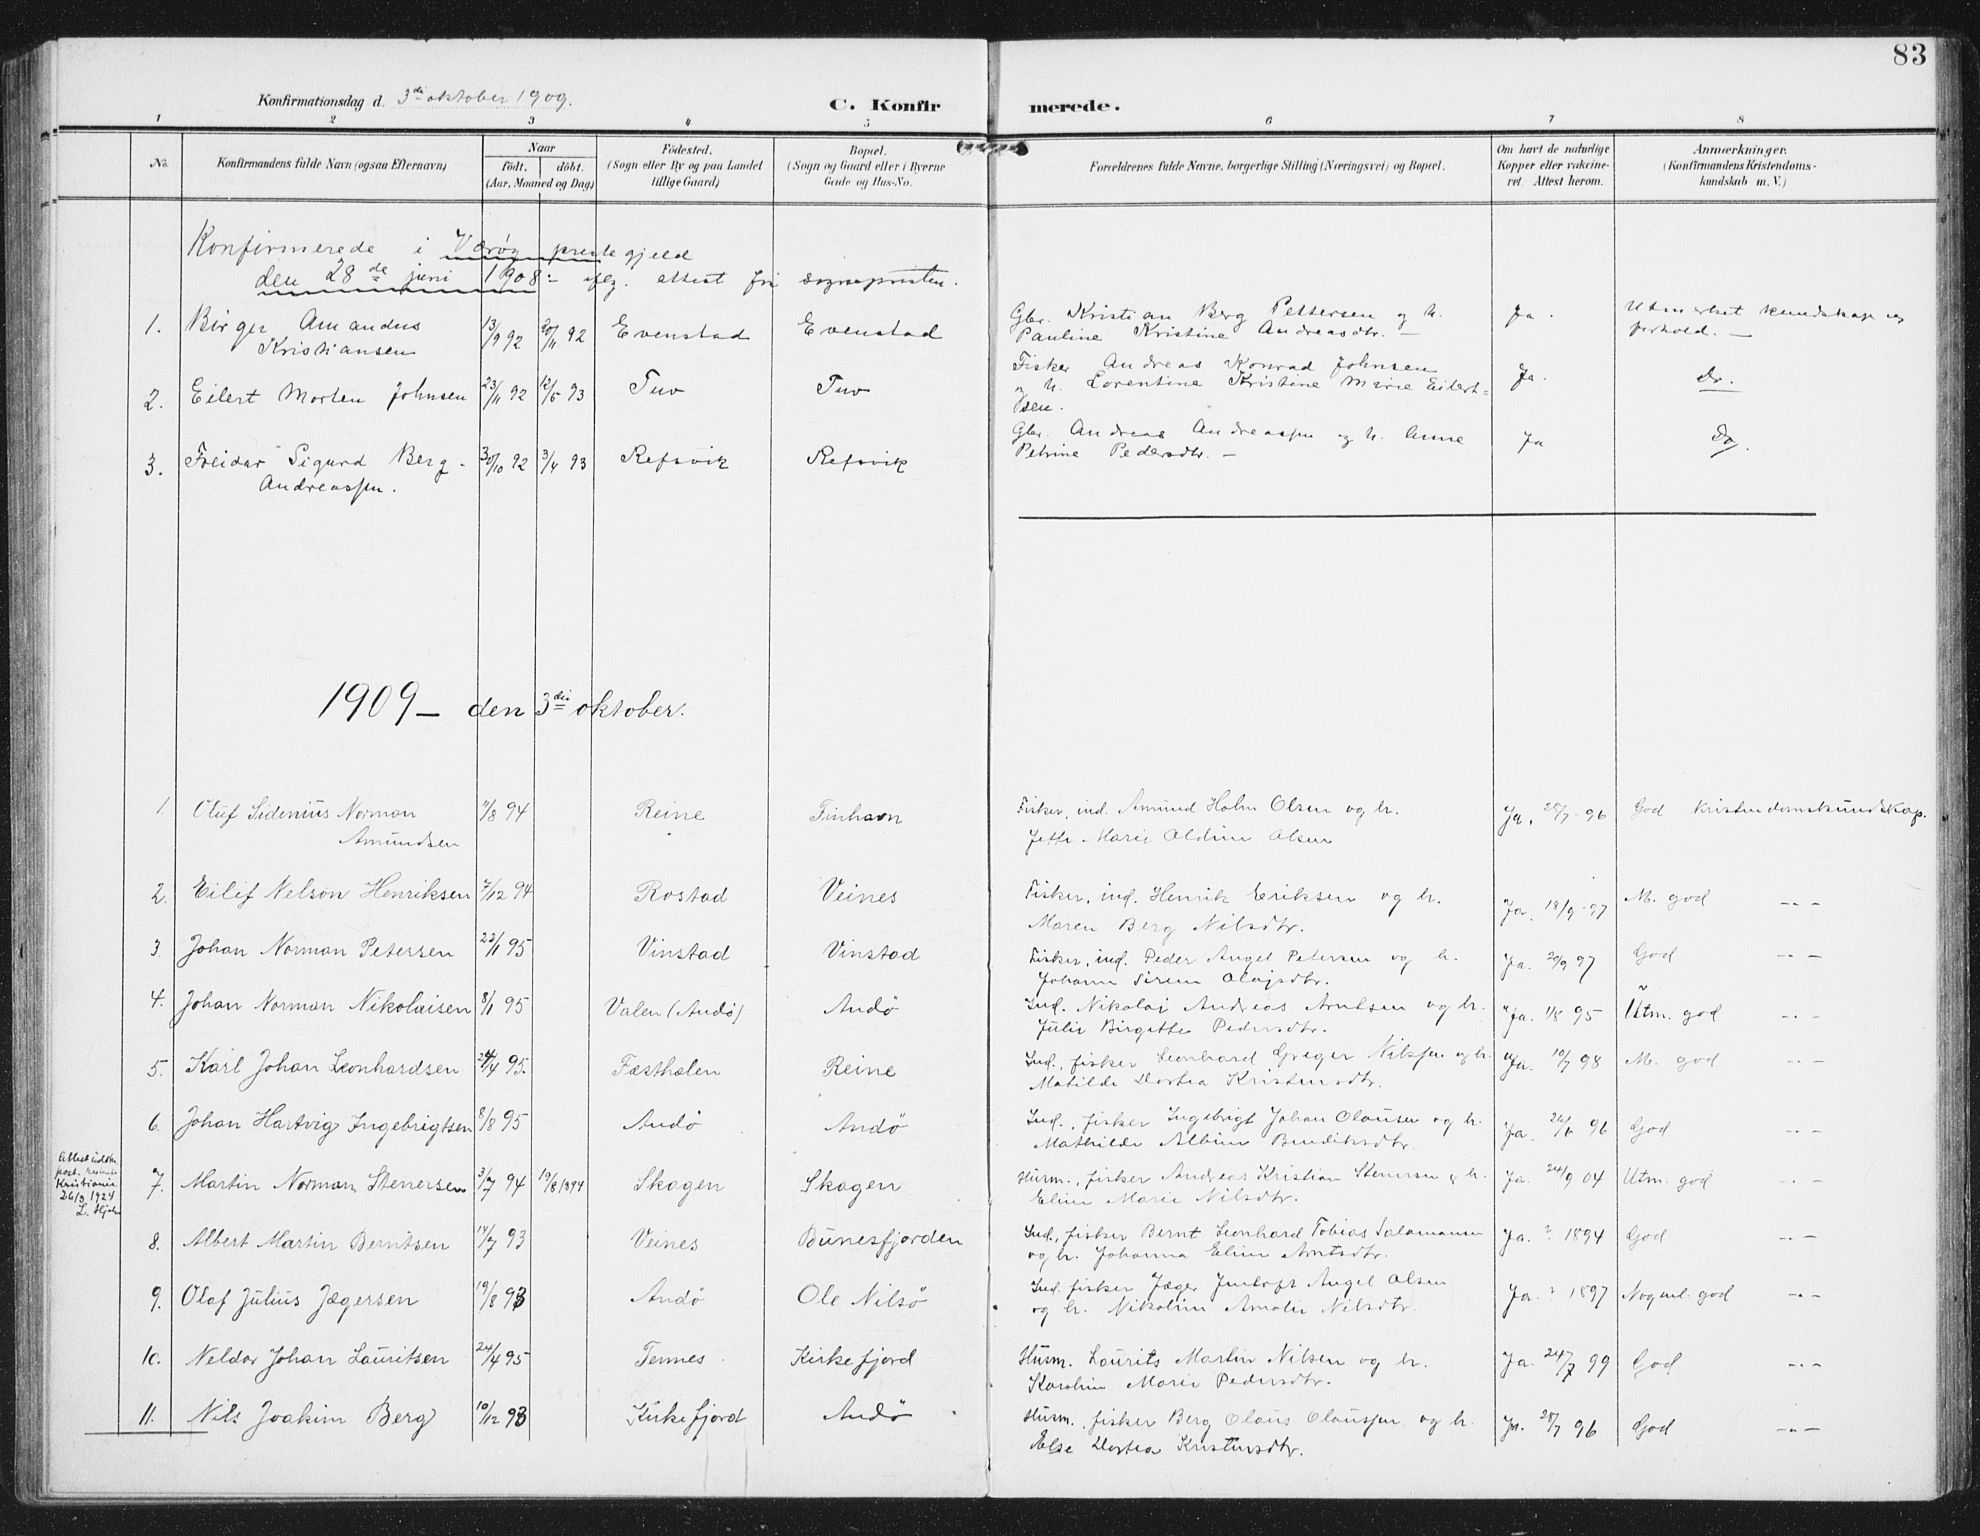 SAT, Ministerialprotokoller, klokkerbøker og fødselsregistre - Nordland, 886/L1221: Ministerialbok nr. 886A03, 1903-1913, s. 83